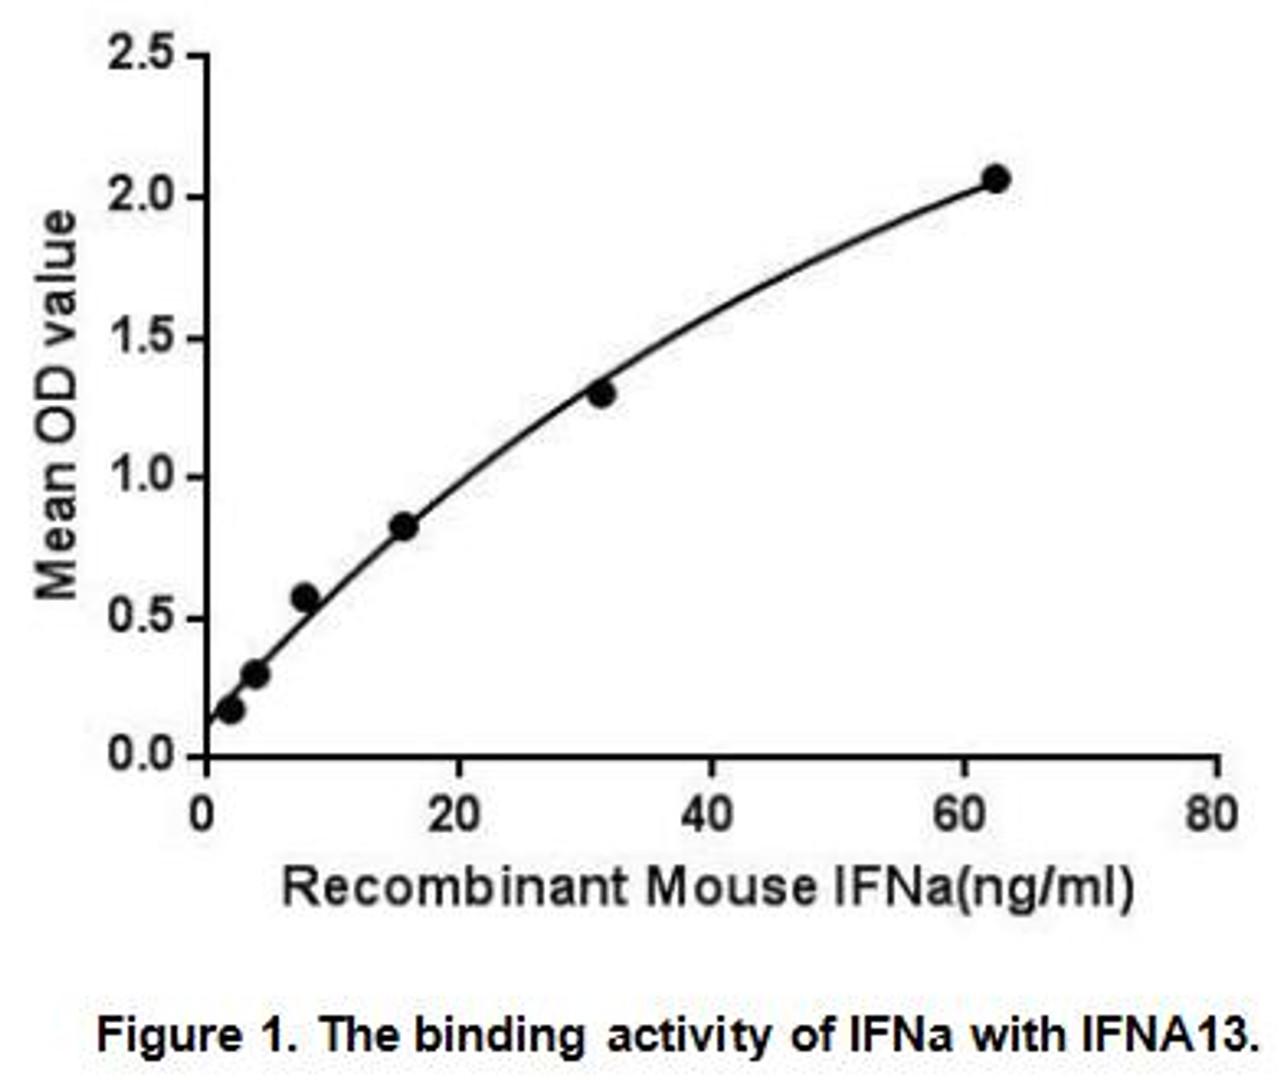 Mouse Active Interferon Alpha (IFNa)